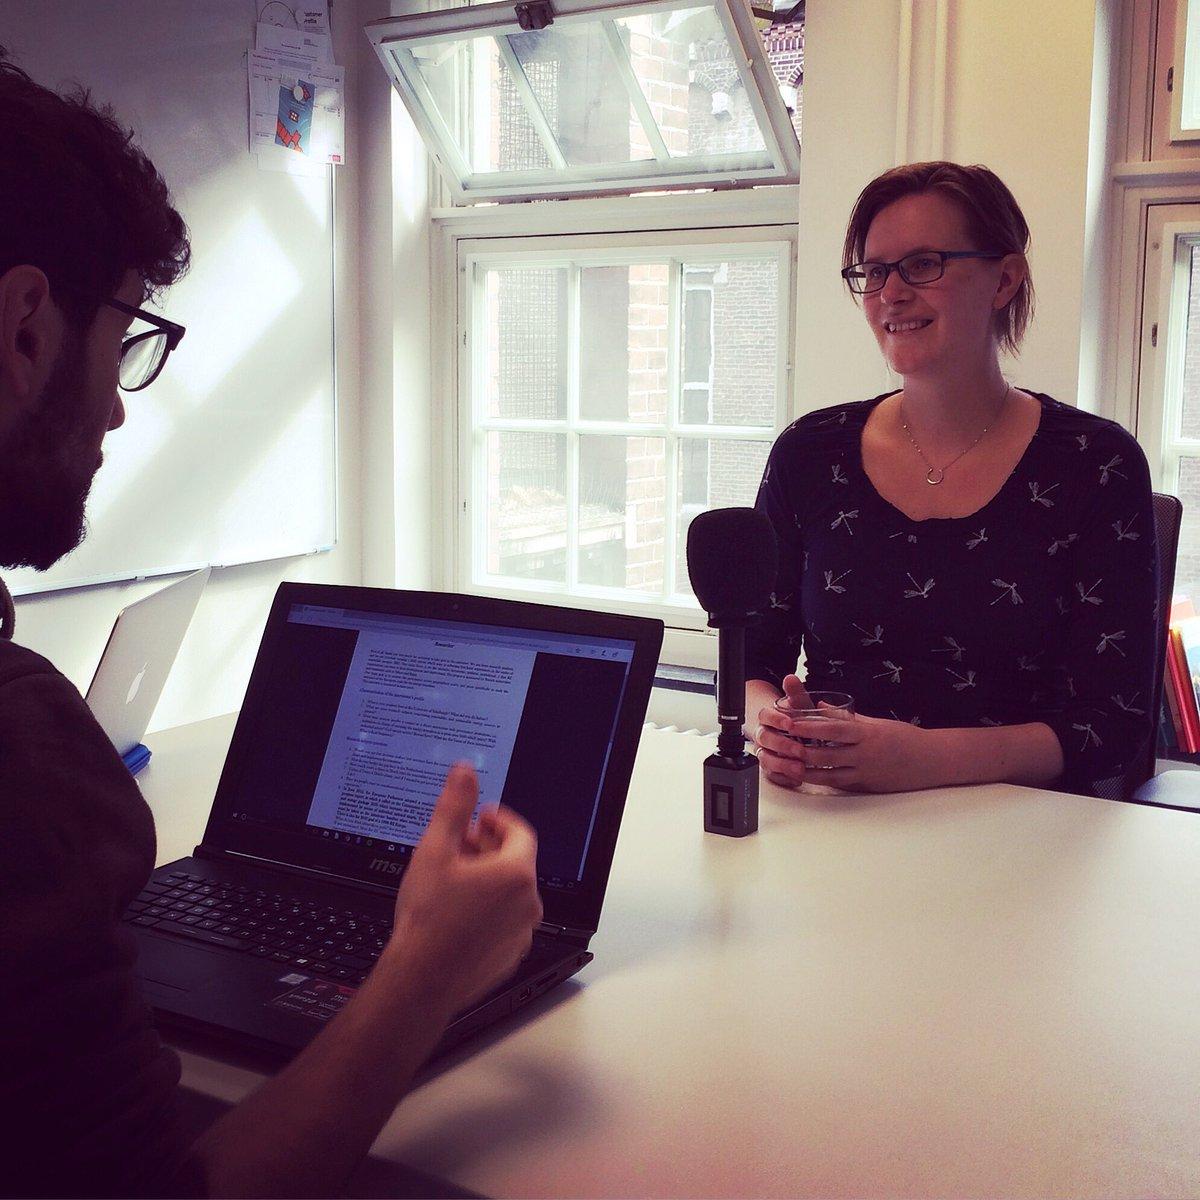 [NETHERLANDS] Already back on tracks! This morning, we met Saskia TIMMER, Project Developer at @AMS_institute  #TREVE #Survey #Europe #REs<br>http://pic.twitter.com/JEgqNl8e3H